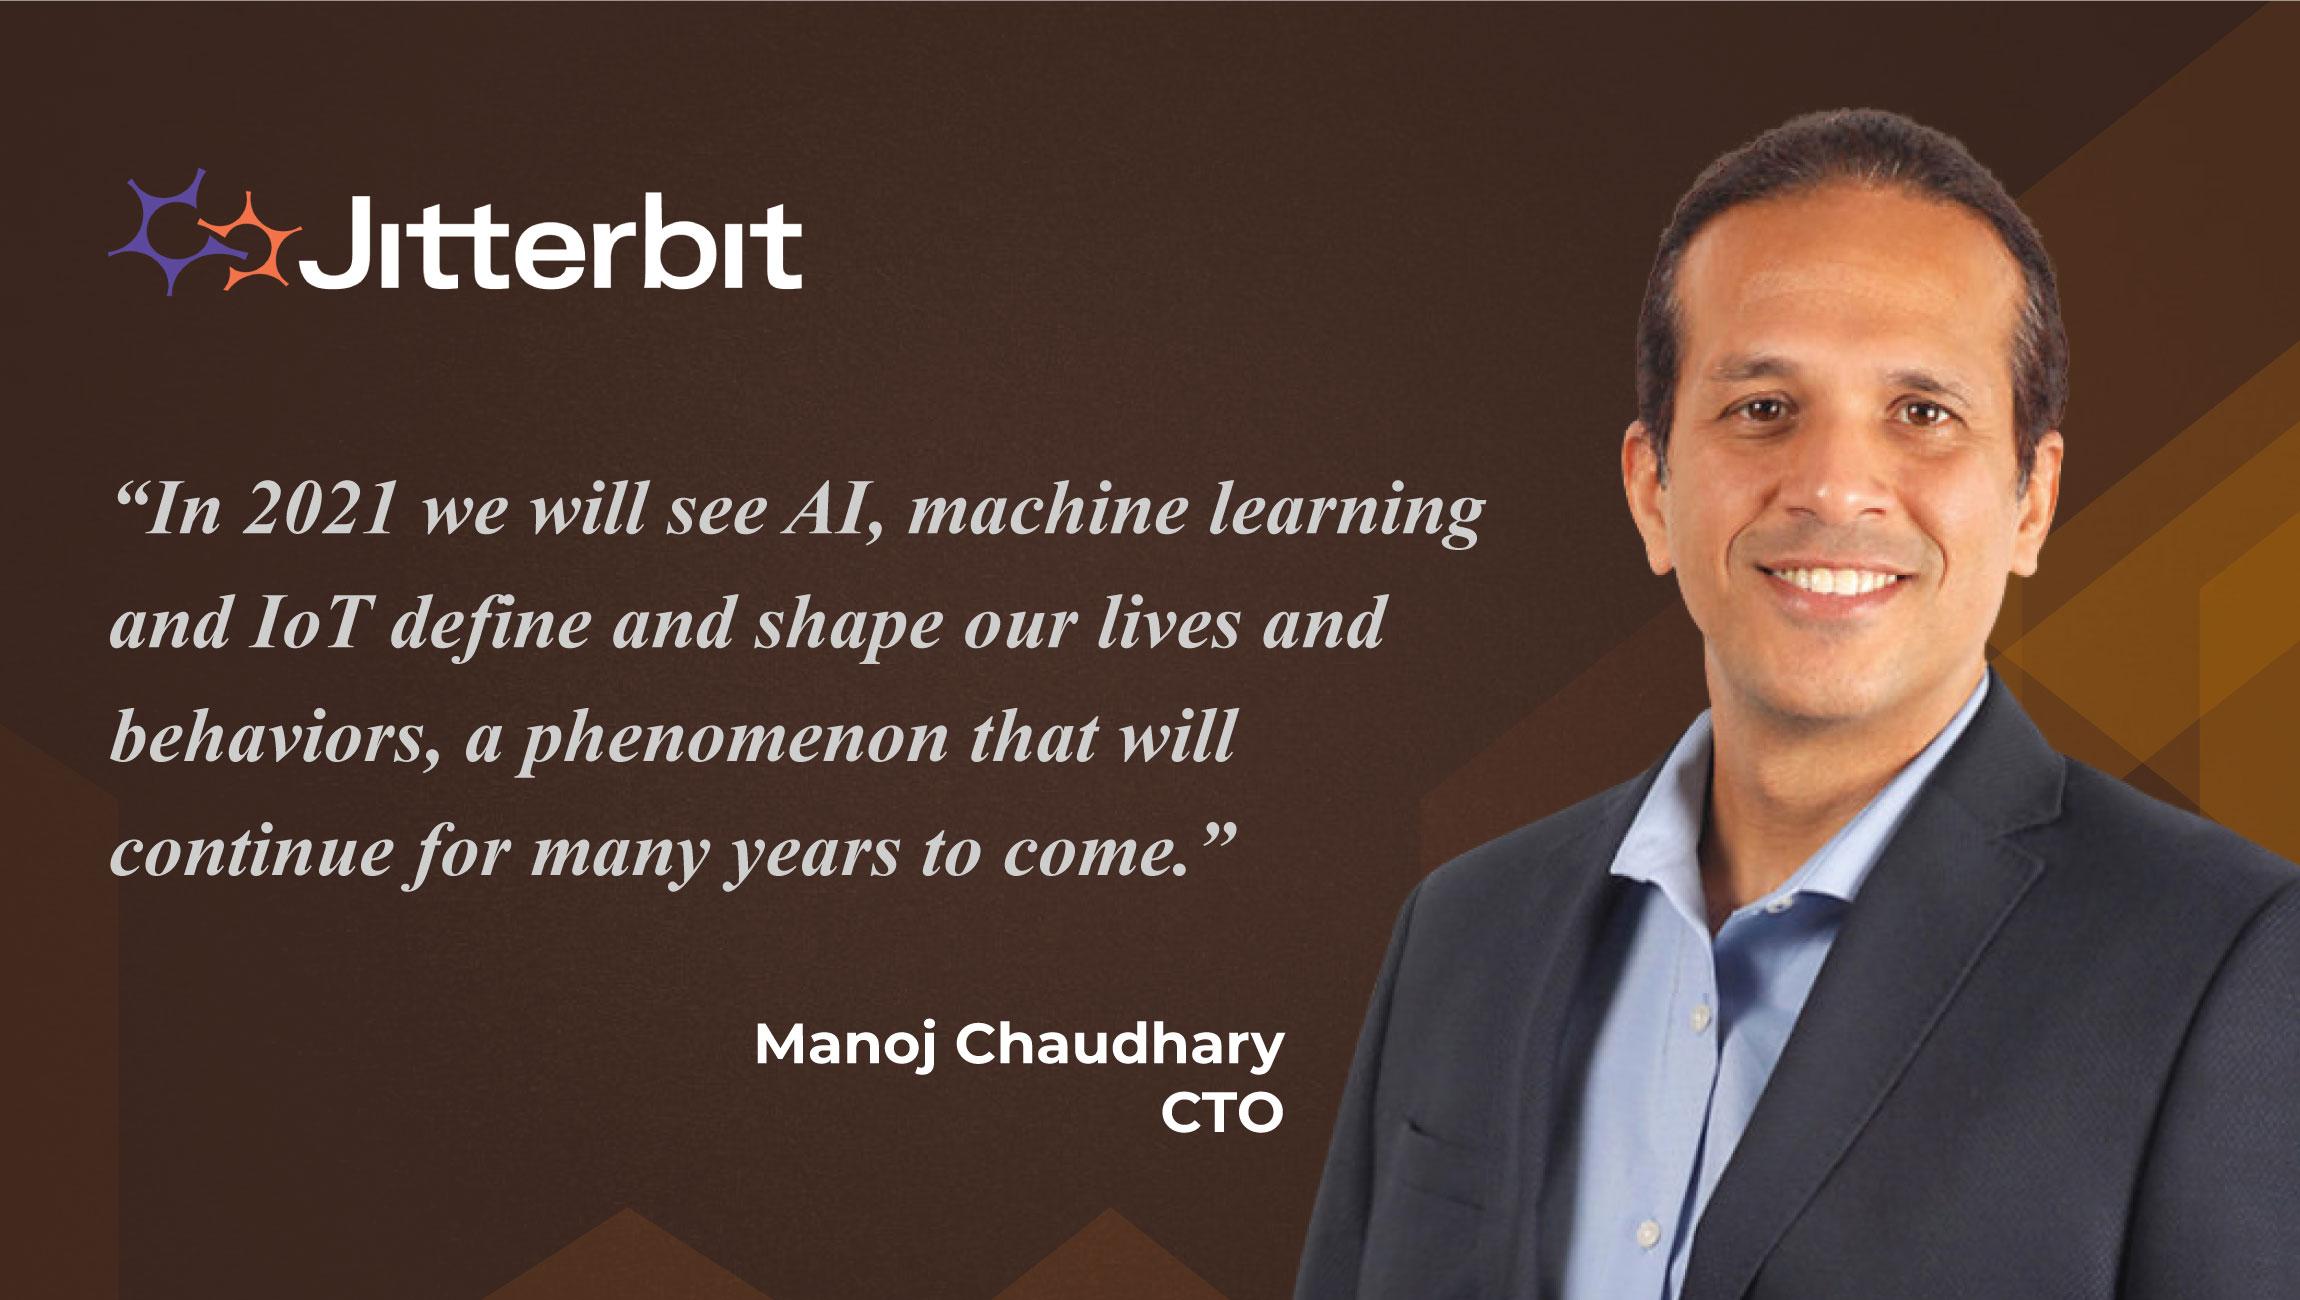 Crystal Gaze 2021: AiThority Interview with Manoj Choudhary, CTO at Jitterbit